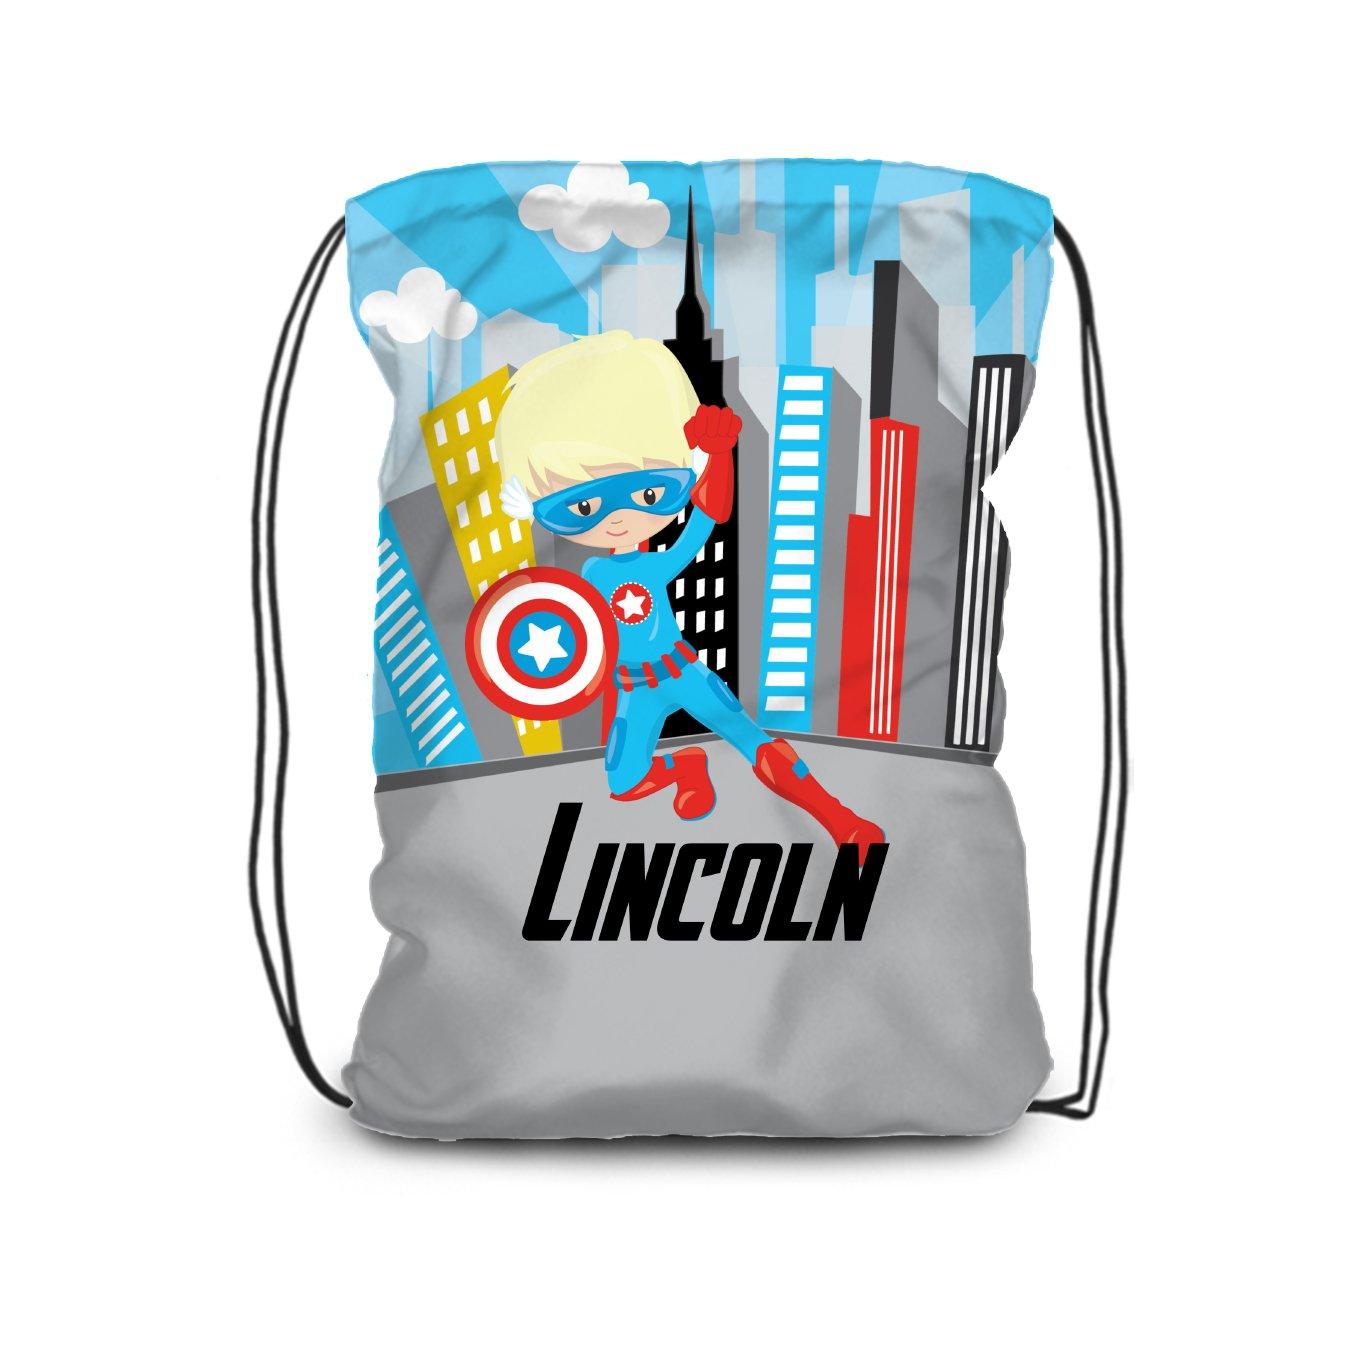 Superhero Drawstring Backpack - Big City Red Superhero Personalized Name Bag